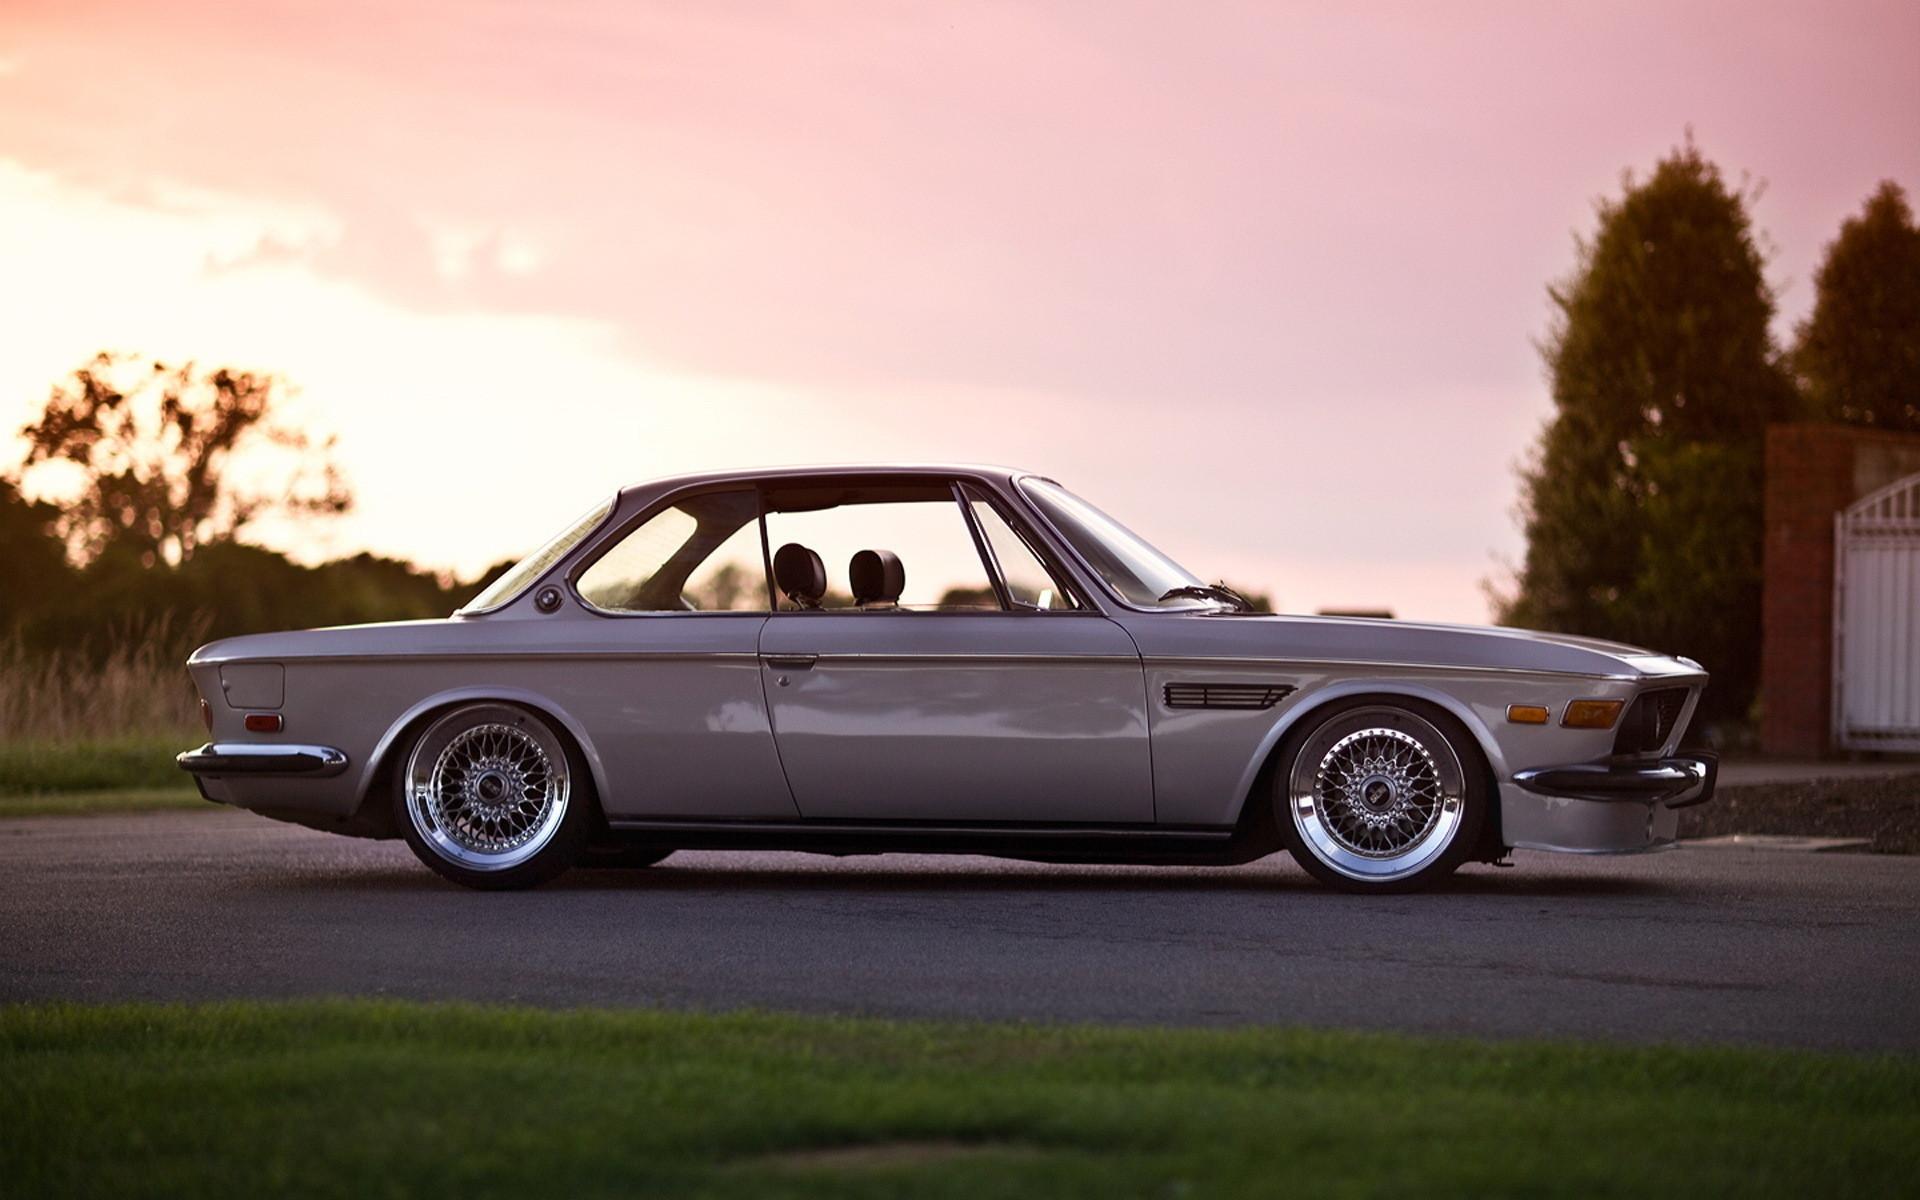 Res: 1920x1200, BMW Lowrider Classic Car Classic Custom 4k Ultra HD Wallpaper 1